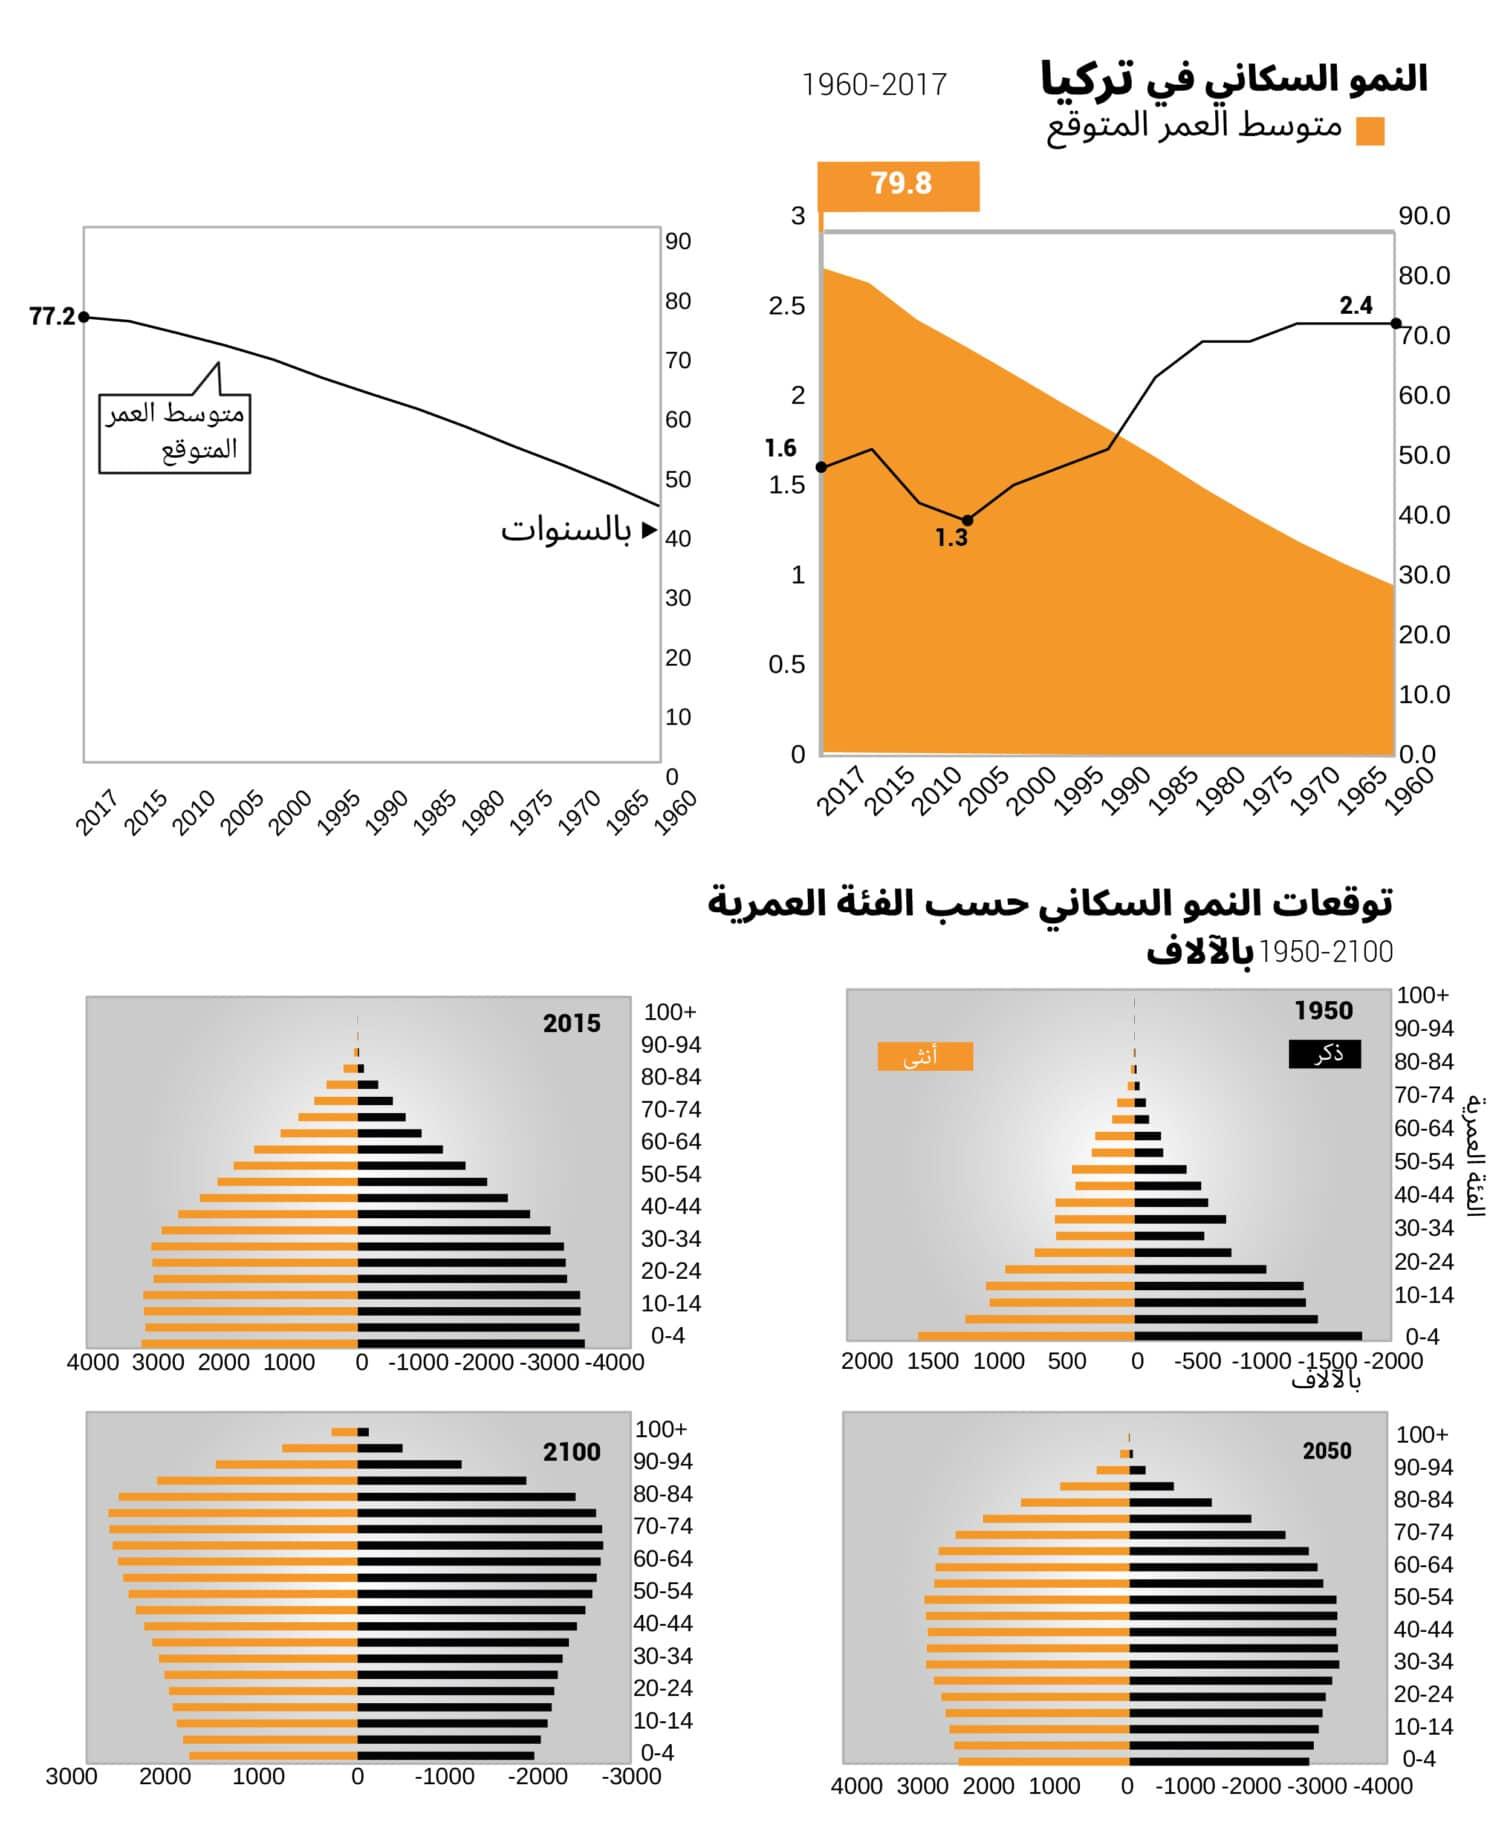 Turkey population growth